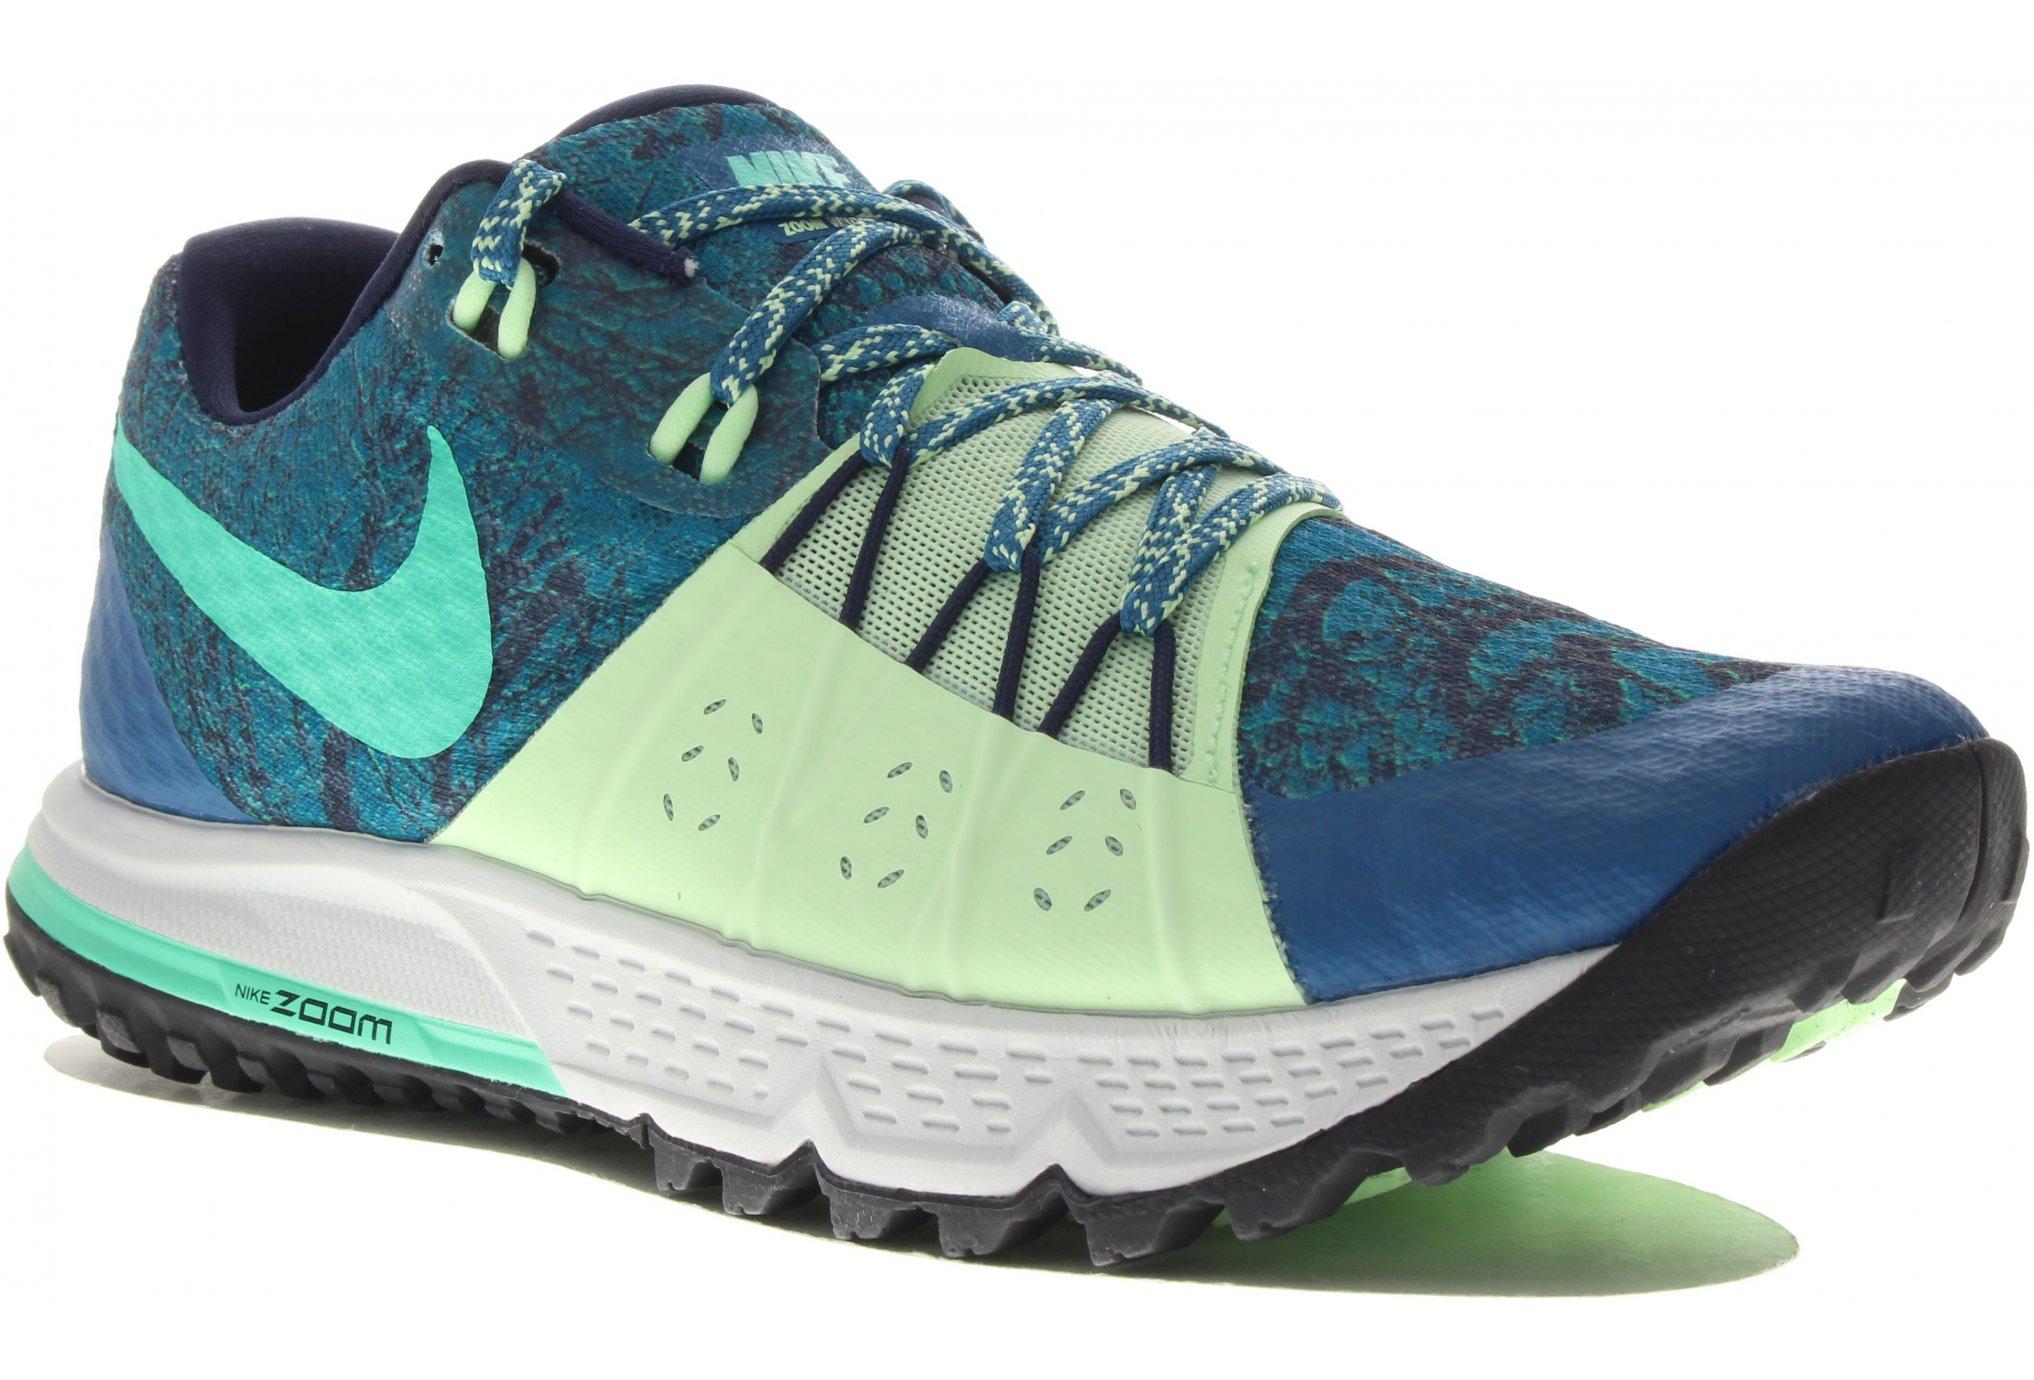 bas prix 97fcb 96ee3 Trail Session - Nike Air Zoom Wildhorse 4 W Chaussures ...